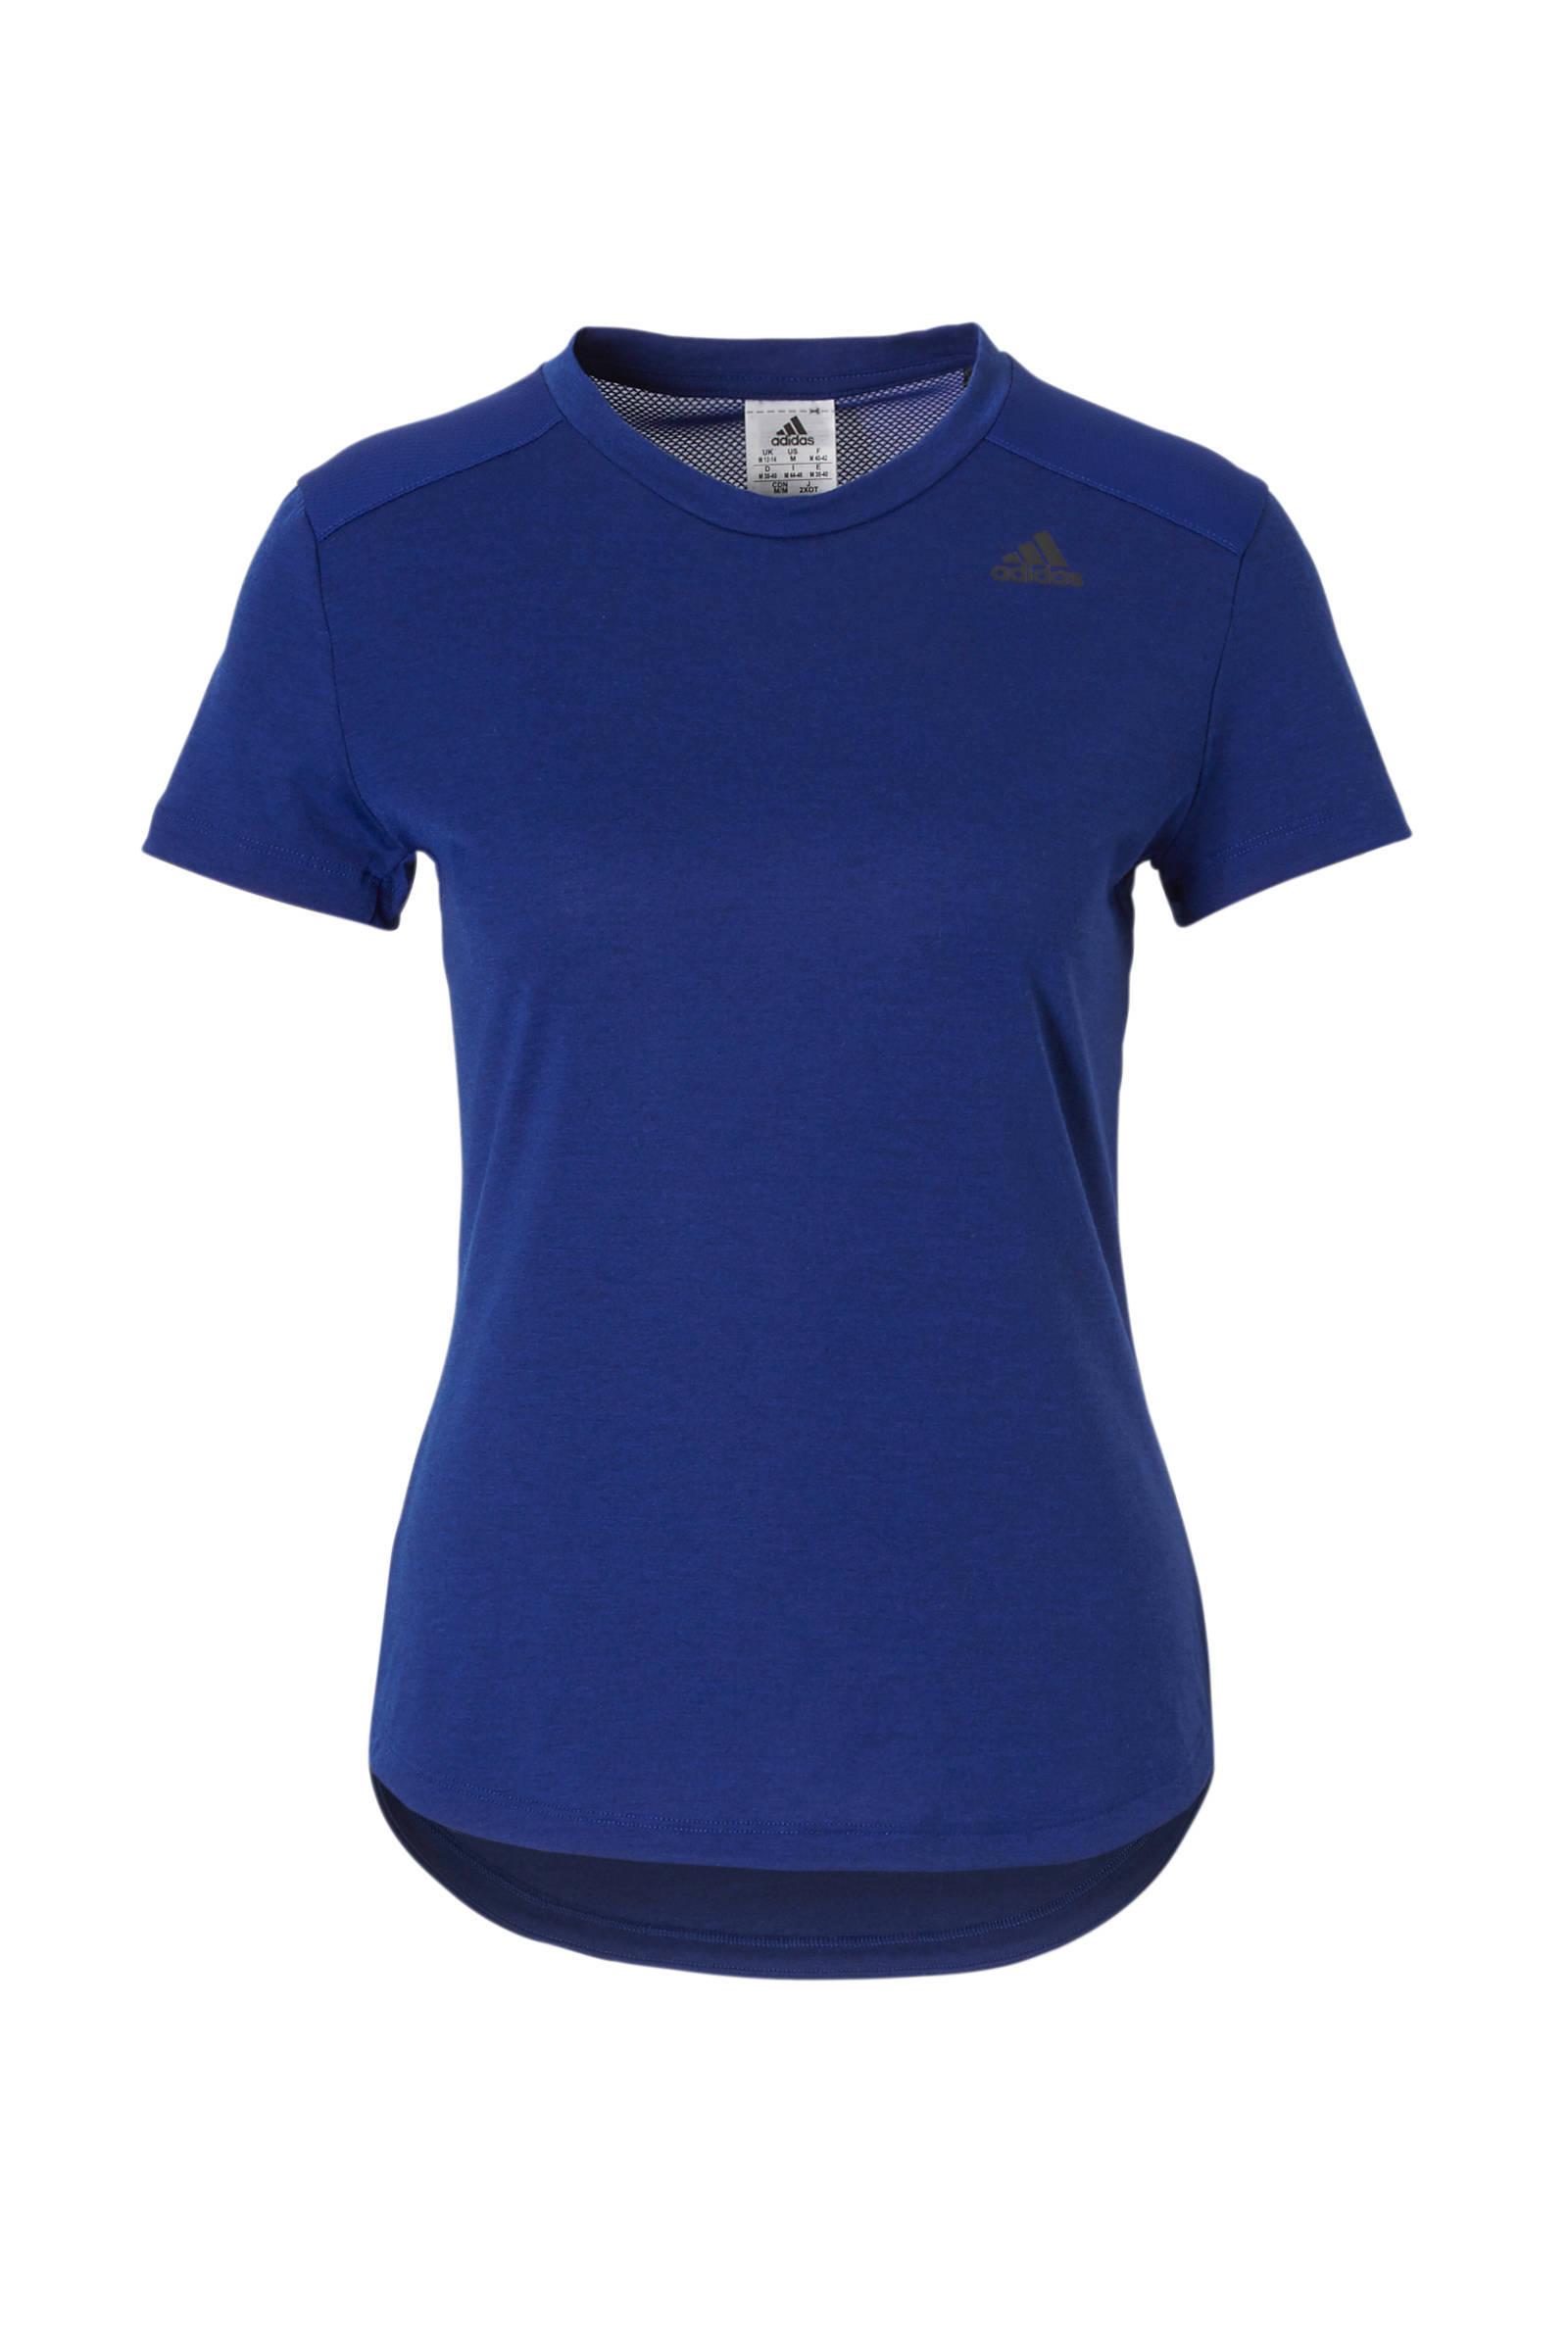 Adidas Sport Shirt Dames Wit | RLDM